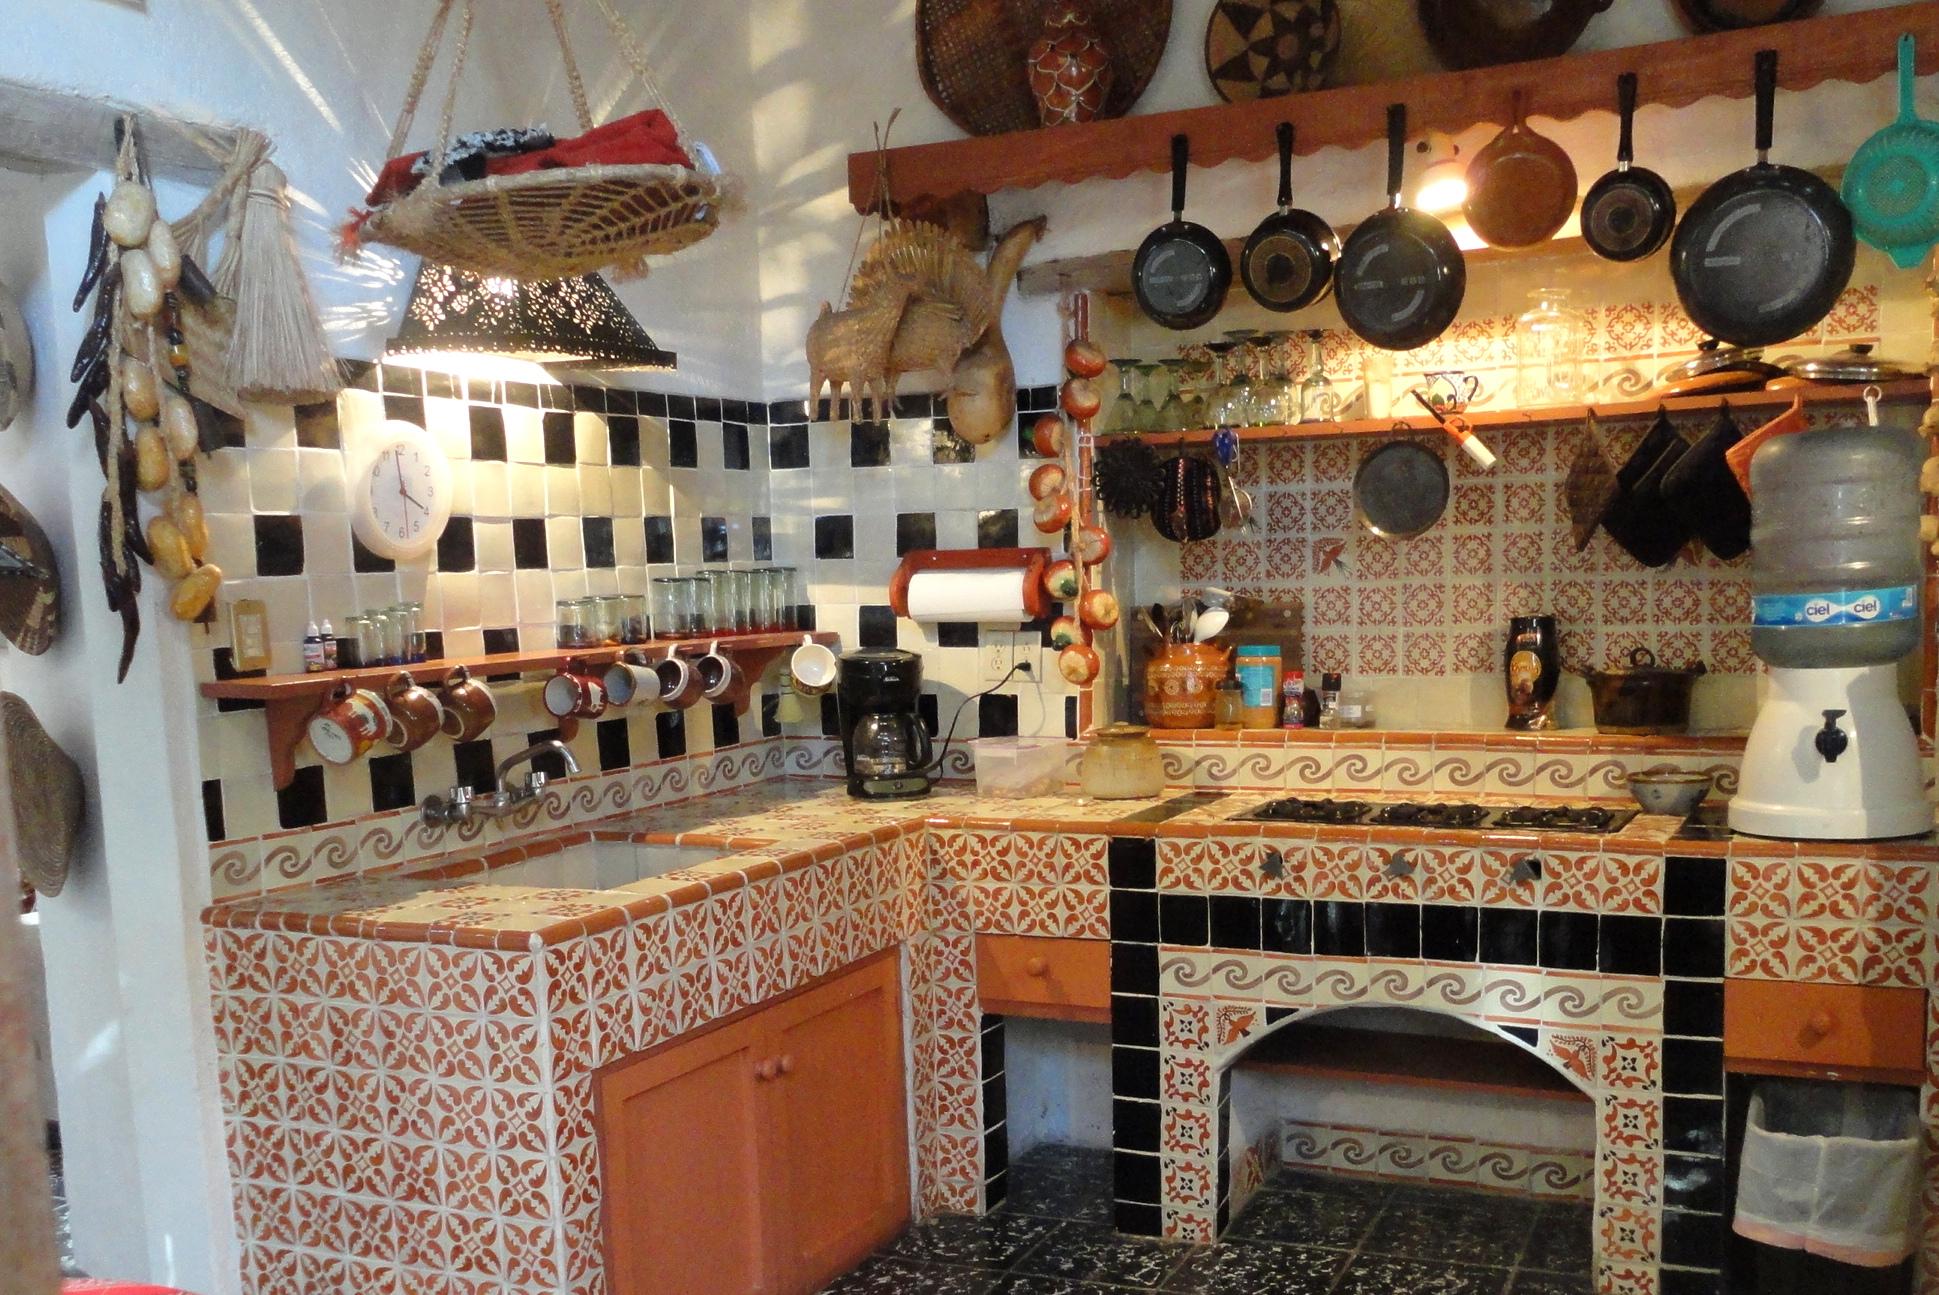 P tett konyh k 2 konyhasziget for Mexican inspired kitchen ideas